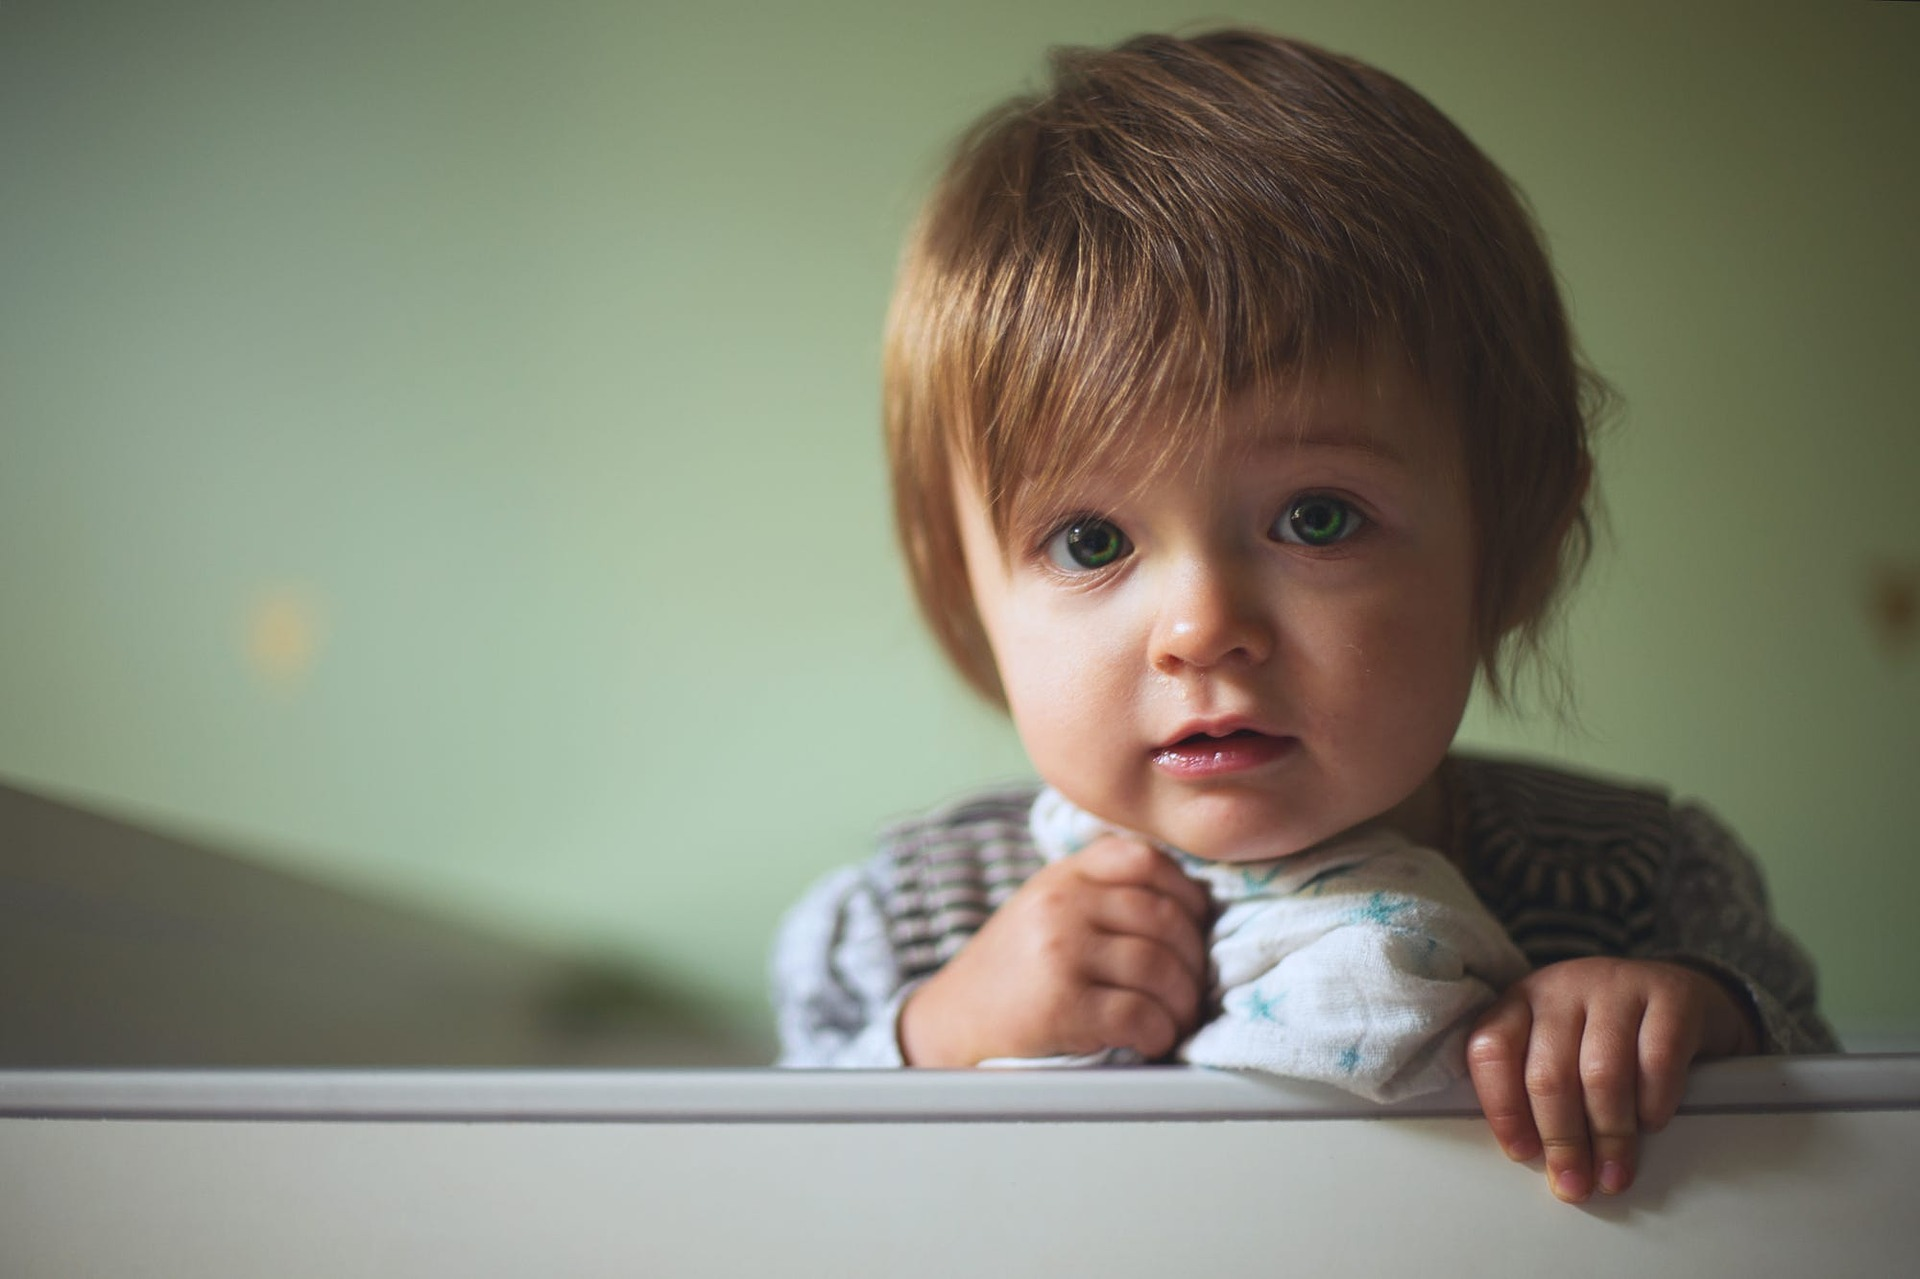 cute-baby-2220375_1920.jpg